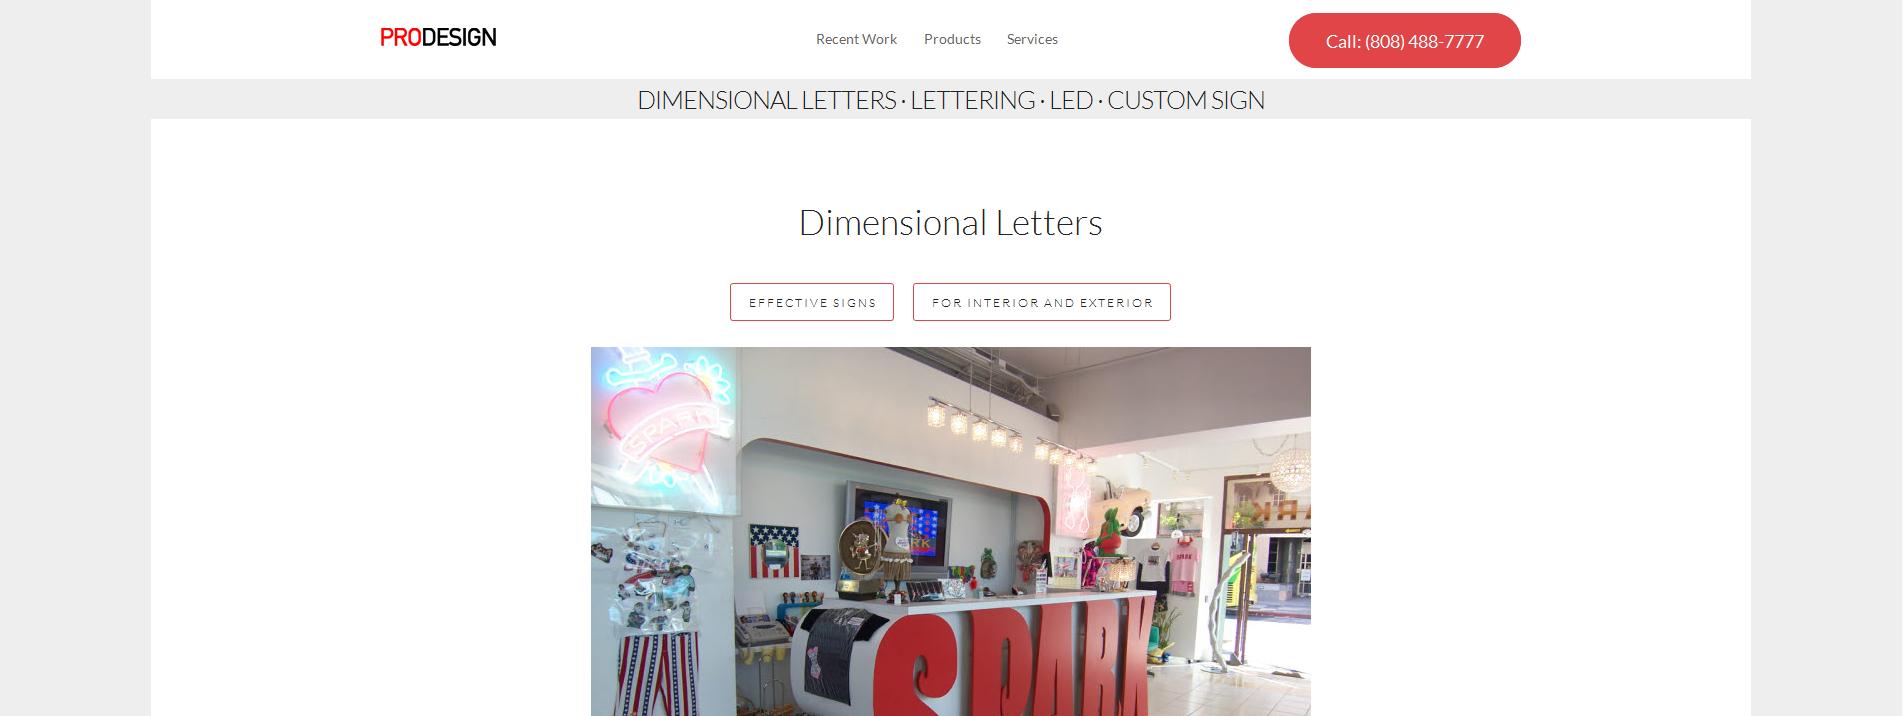 www.4887777.com/dimensional-letters.html